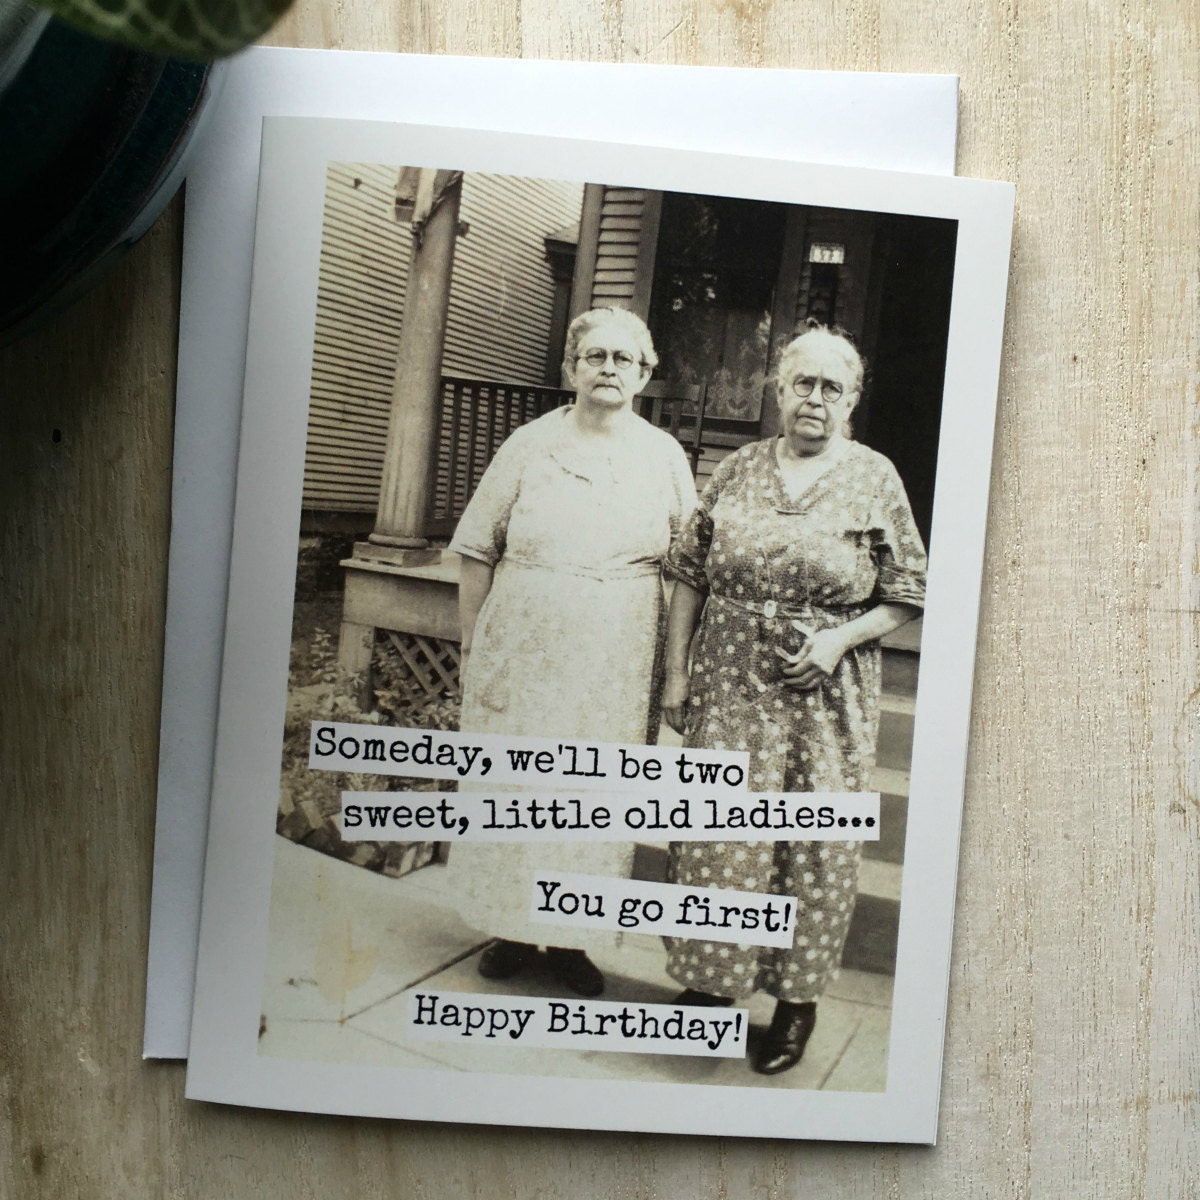 Funny Birthday Greeting Card. Vintage Photo. Someday